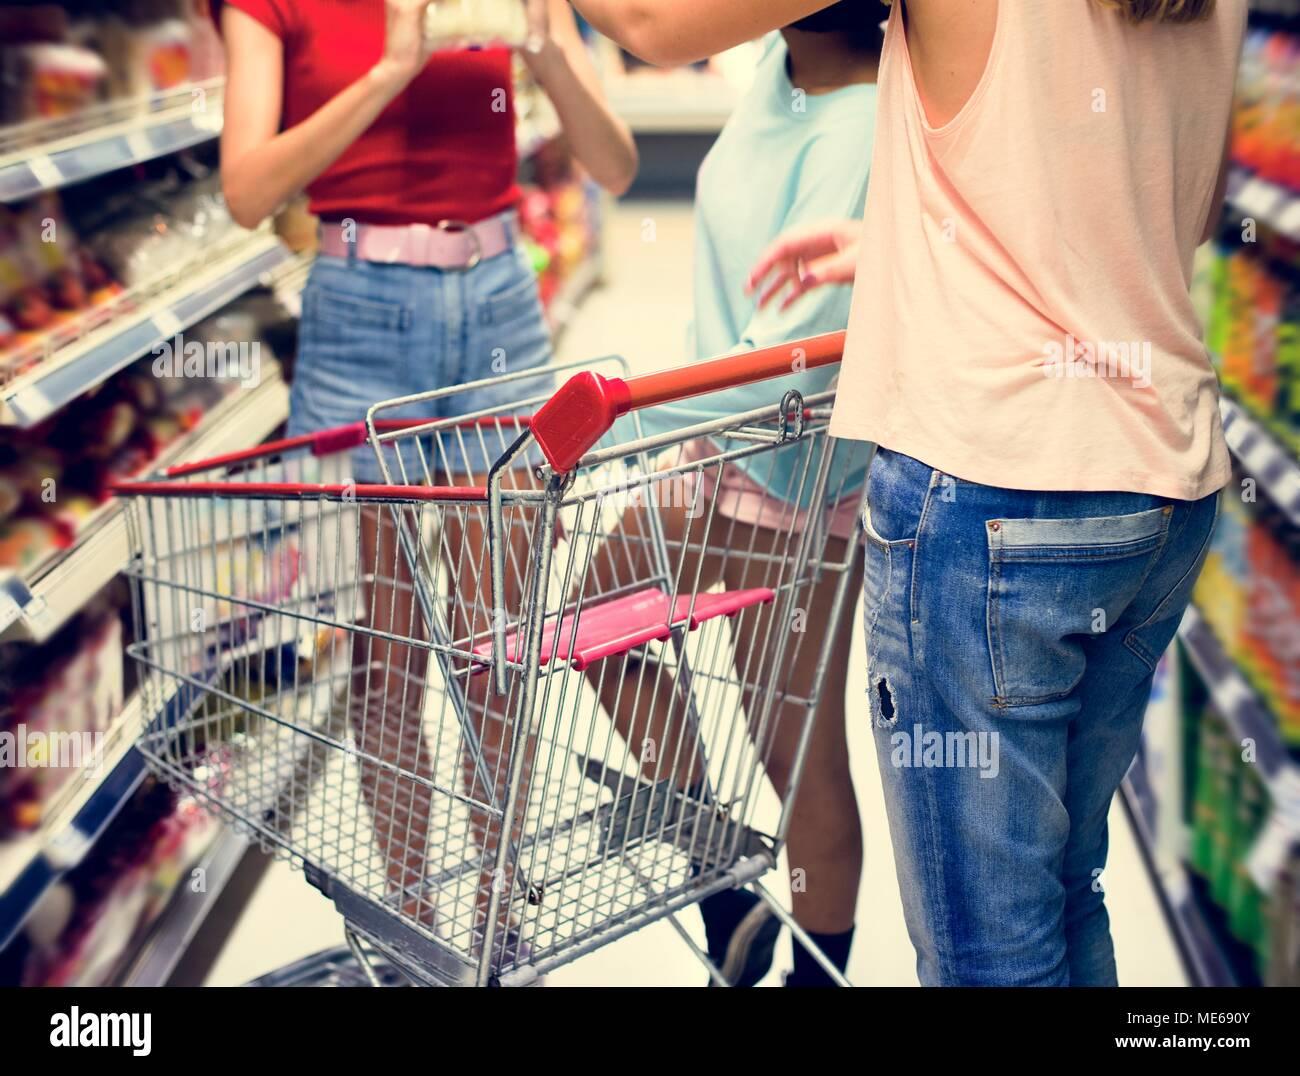 ab470807fb Frauen einkaufen Stockfoto, Bild: 180847659 - Alamy